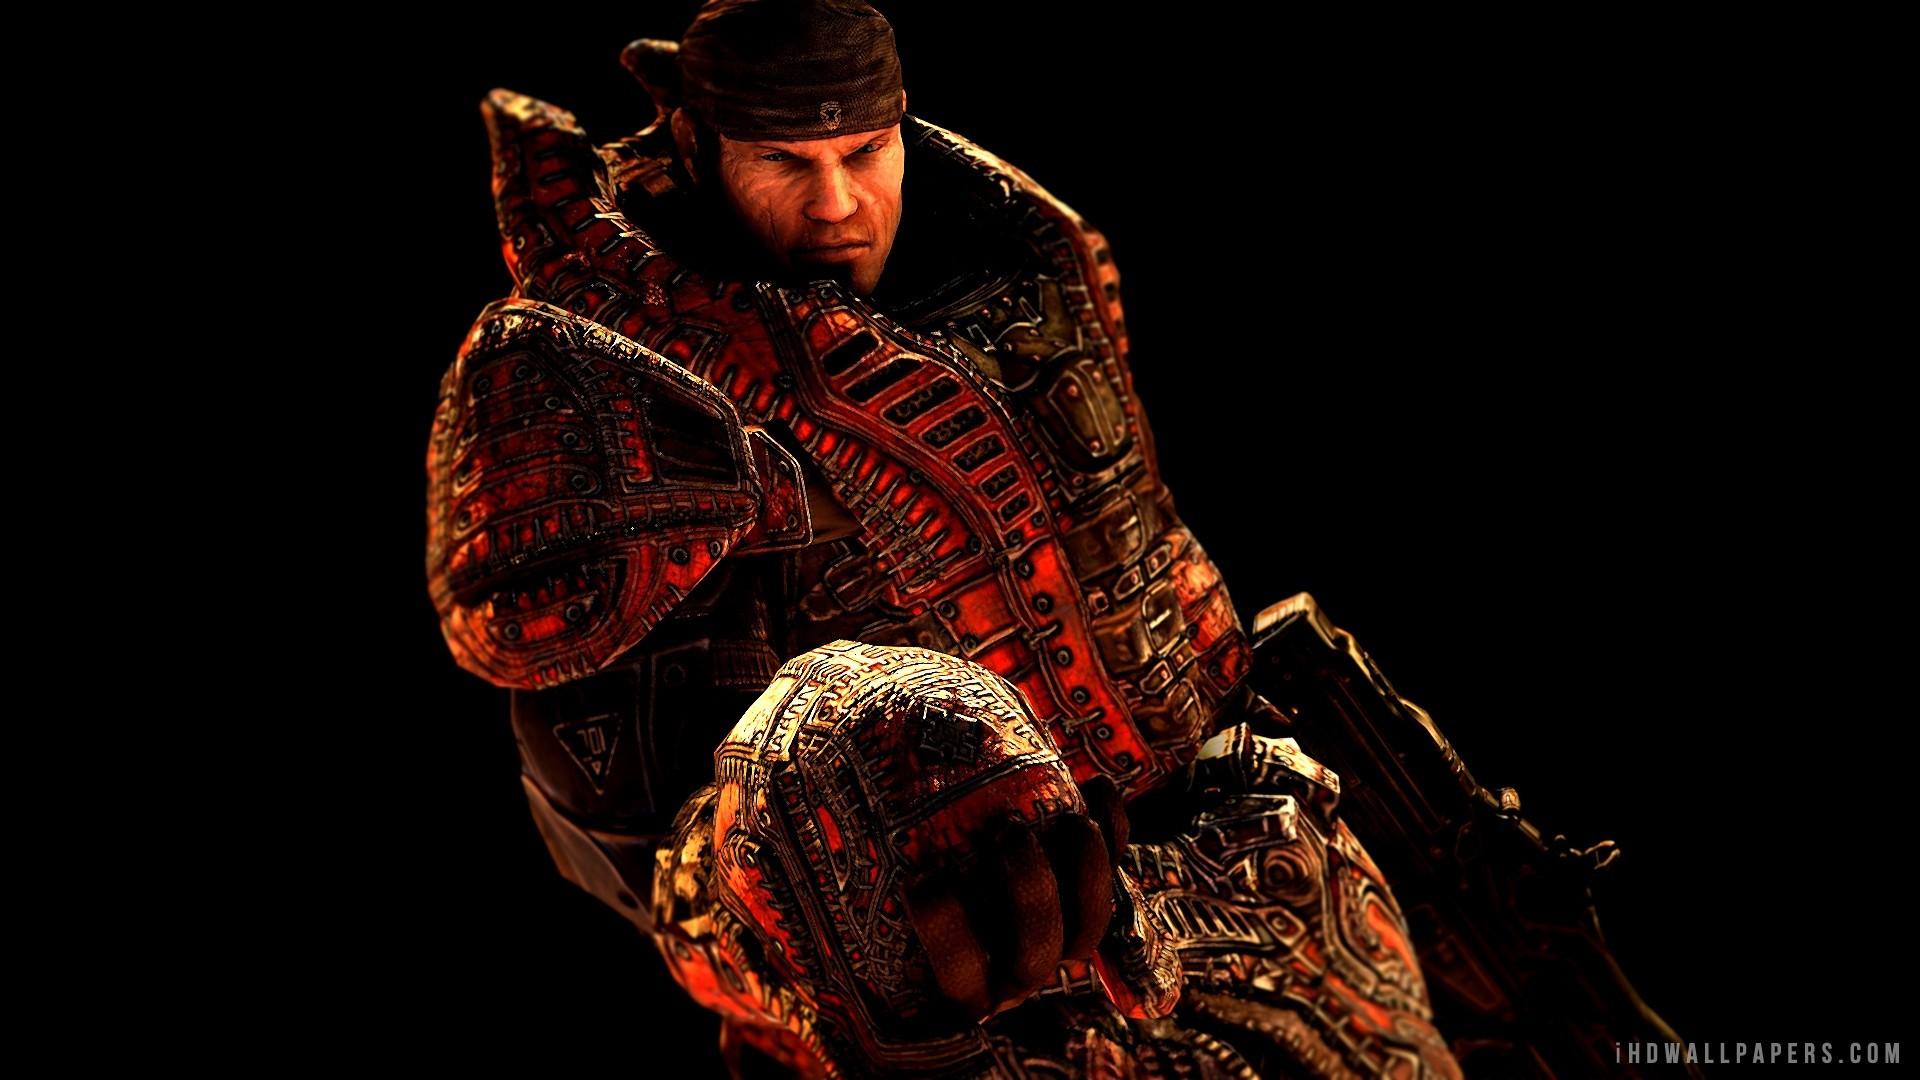 2560x1440 Gears Of War 3 17 Wallpaper Jpg